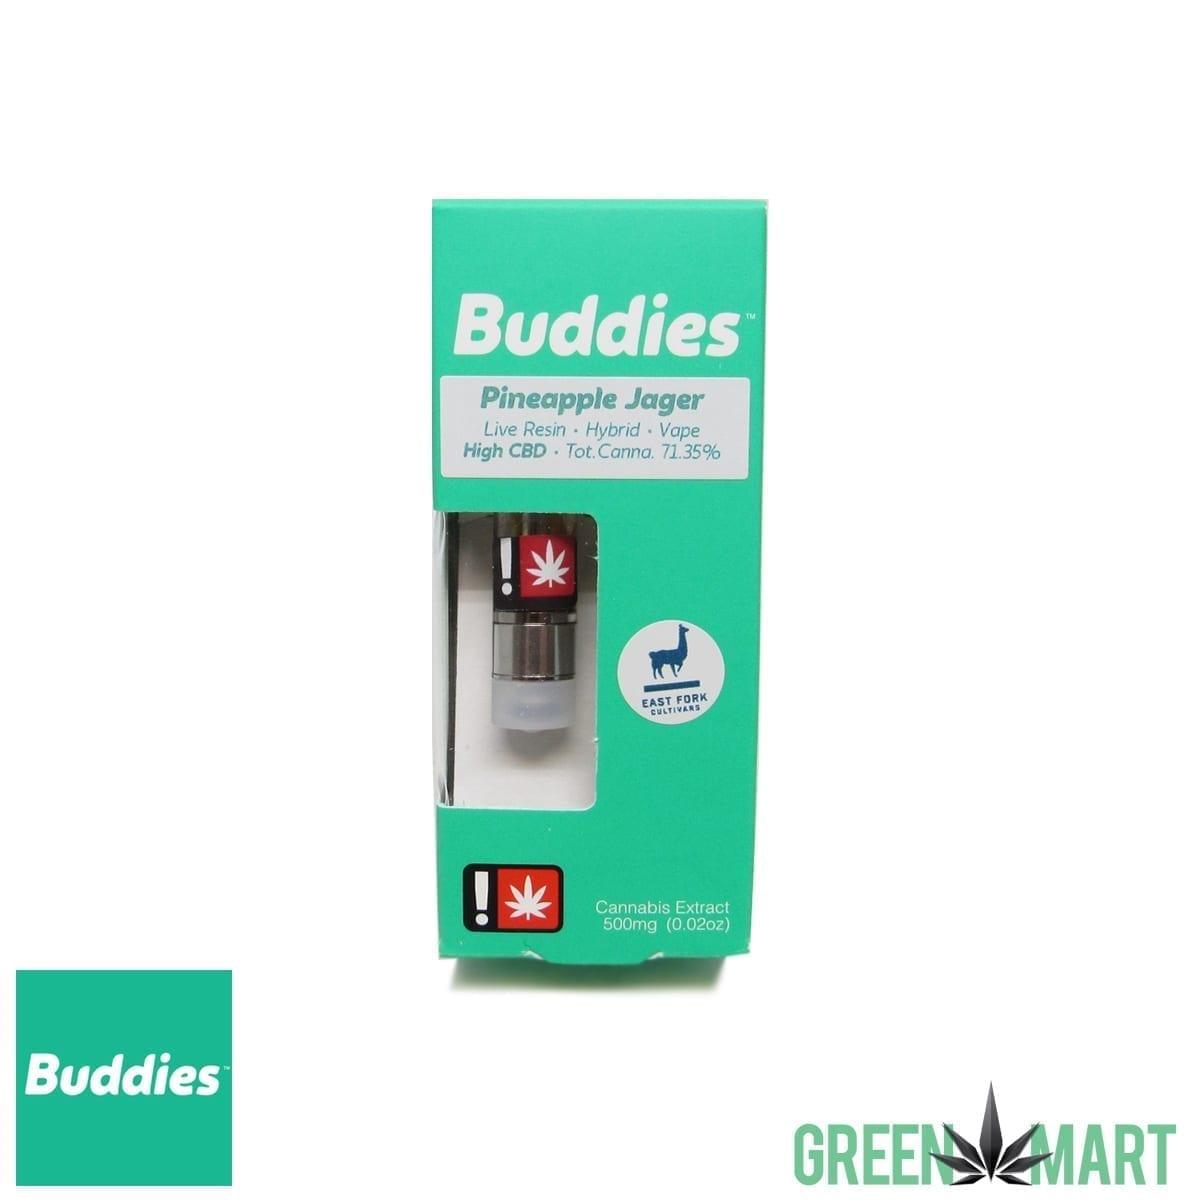 Buddies Brand  5g Live Resin Cartridge – Pineapple Jager